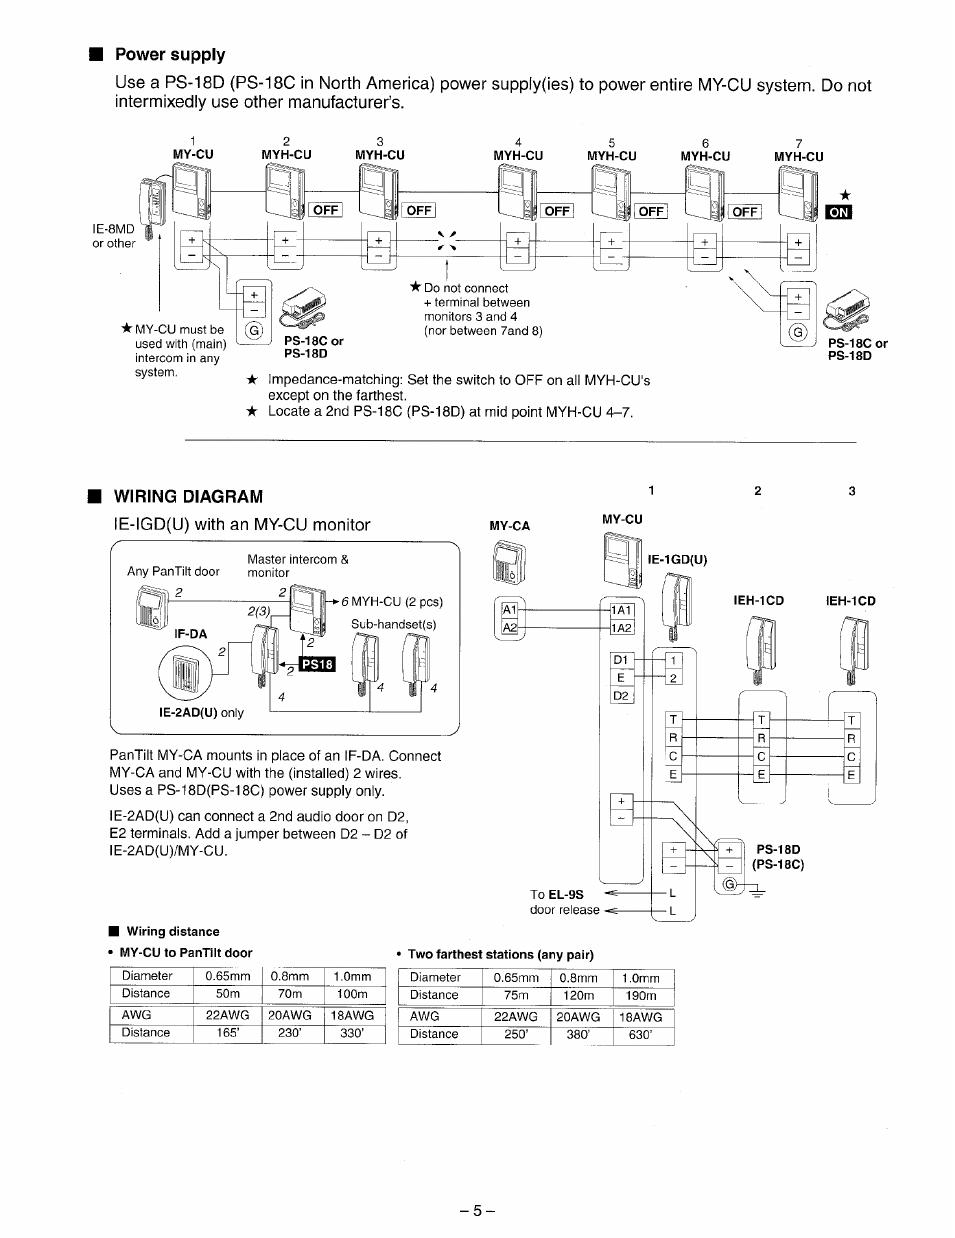 Aiphone Td 6h Wiring Diagram